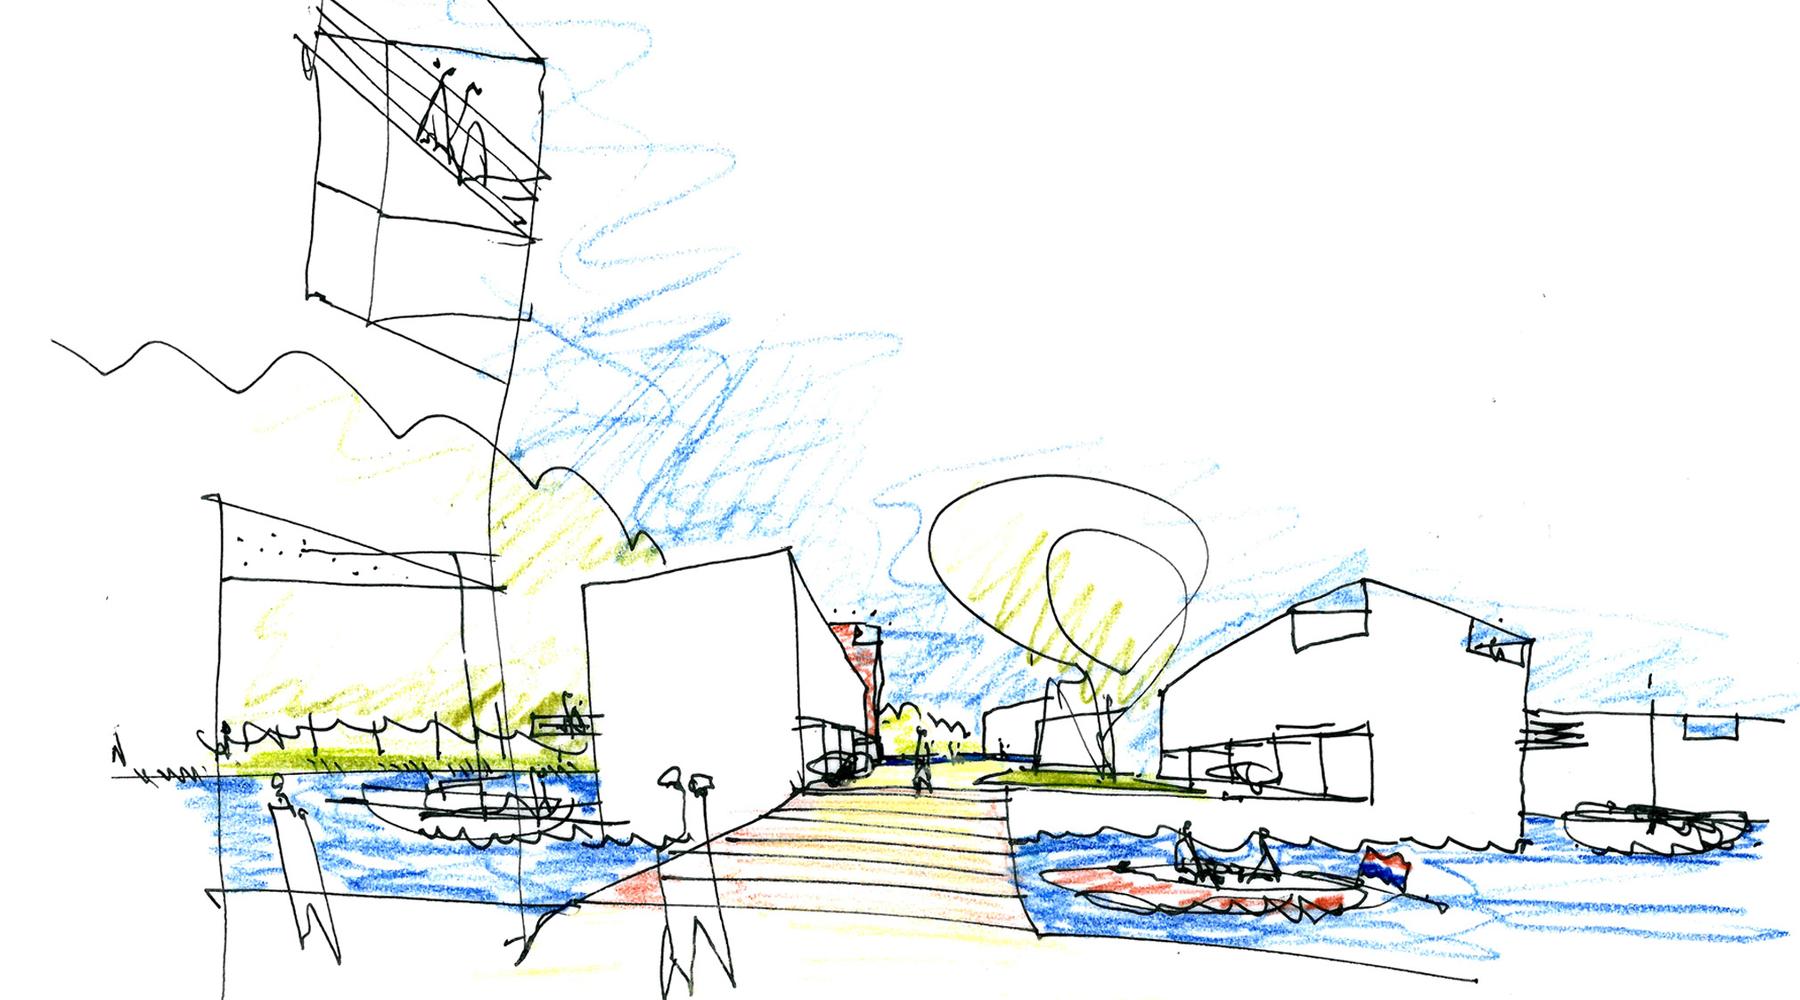 morfis-urbanism-binckhorst-04